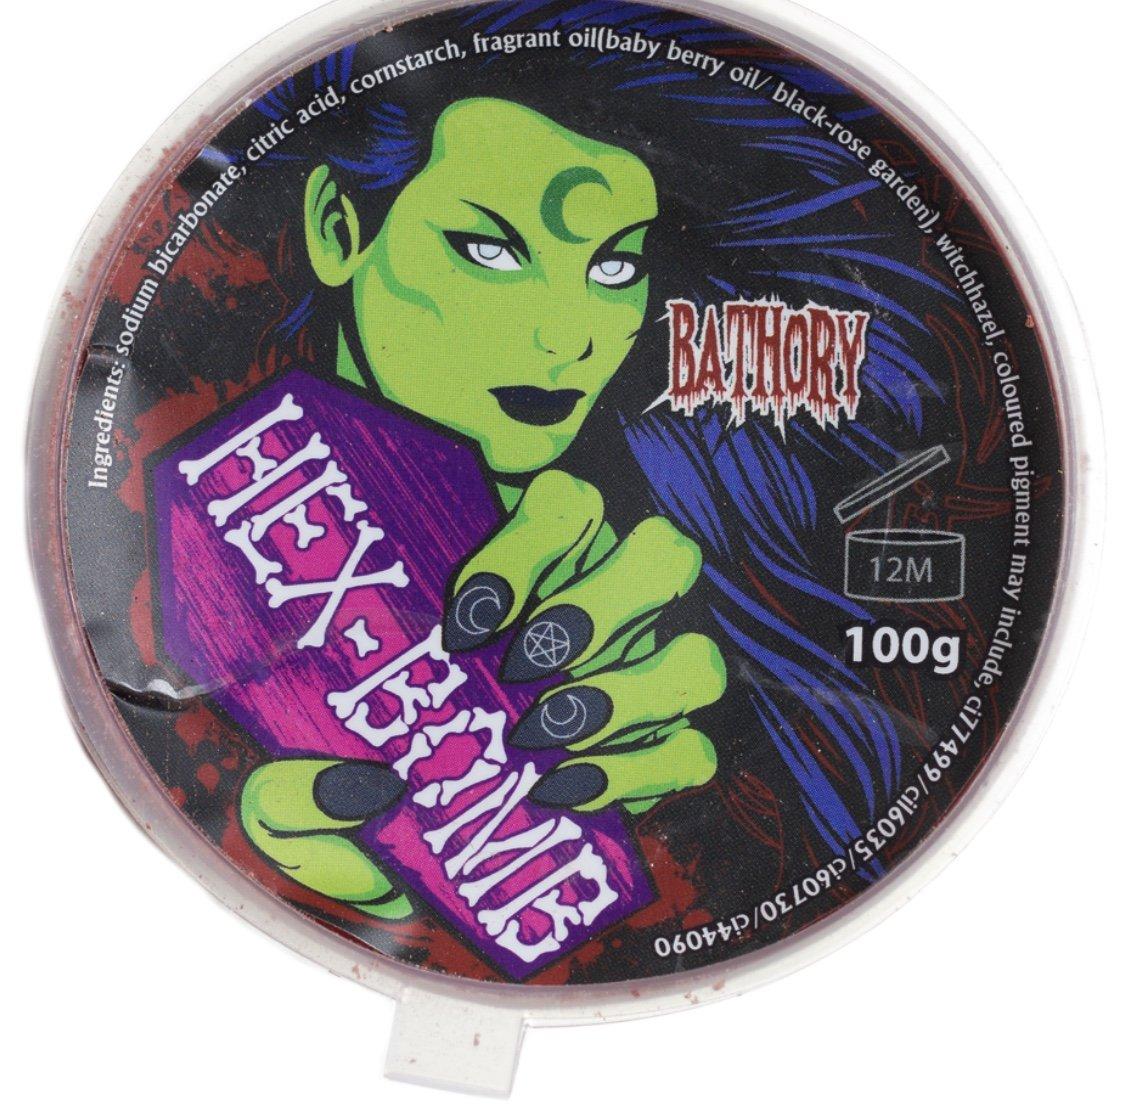 Bathory bloodbath hexbomb bathomb goth bath hexbomb ltd